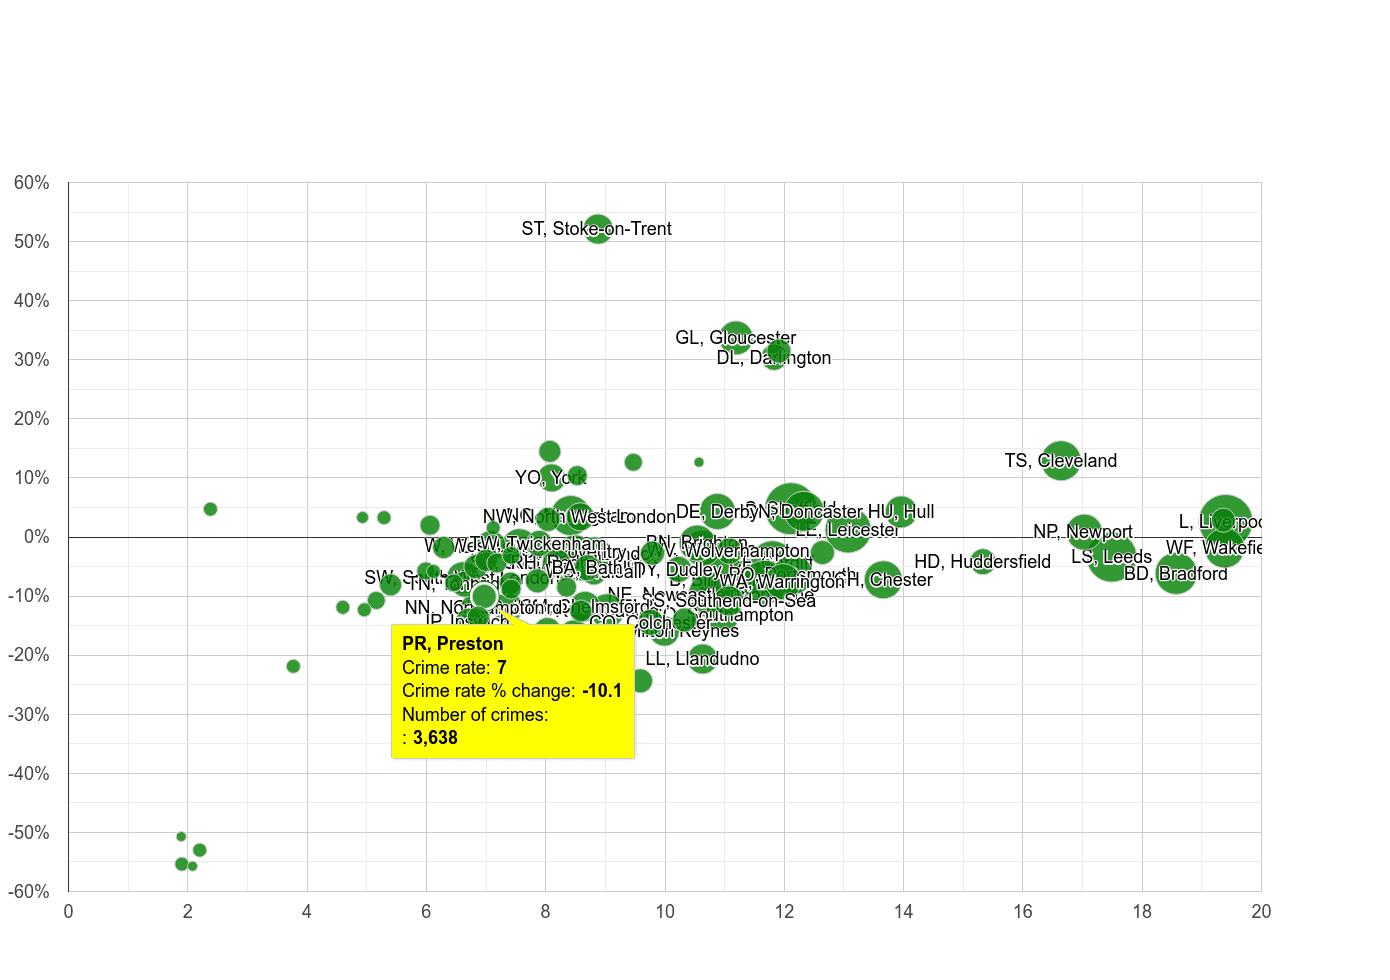 Preston public order crime rate compared to other areas